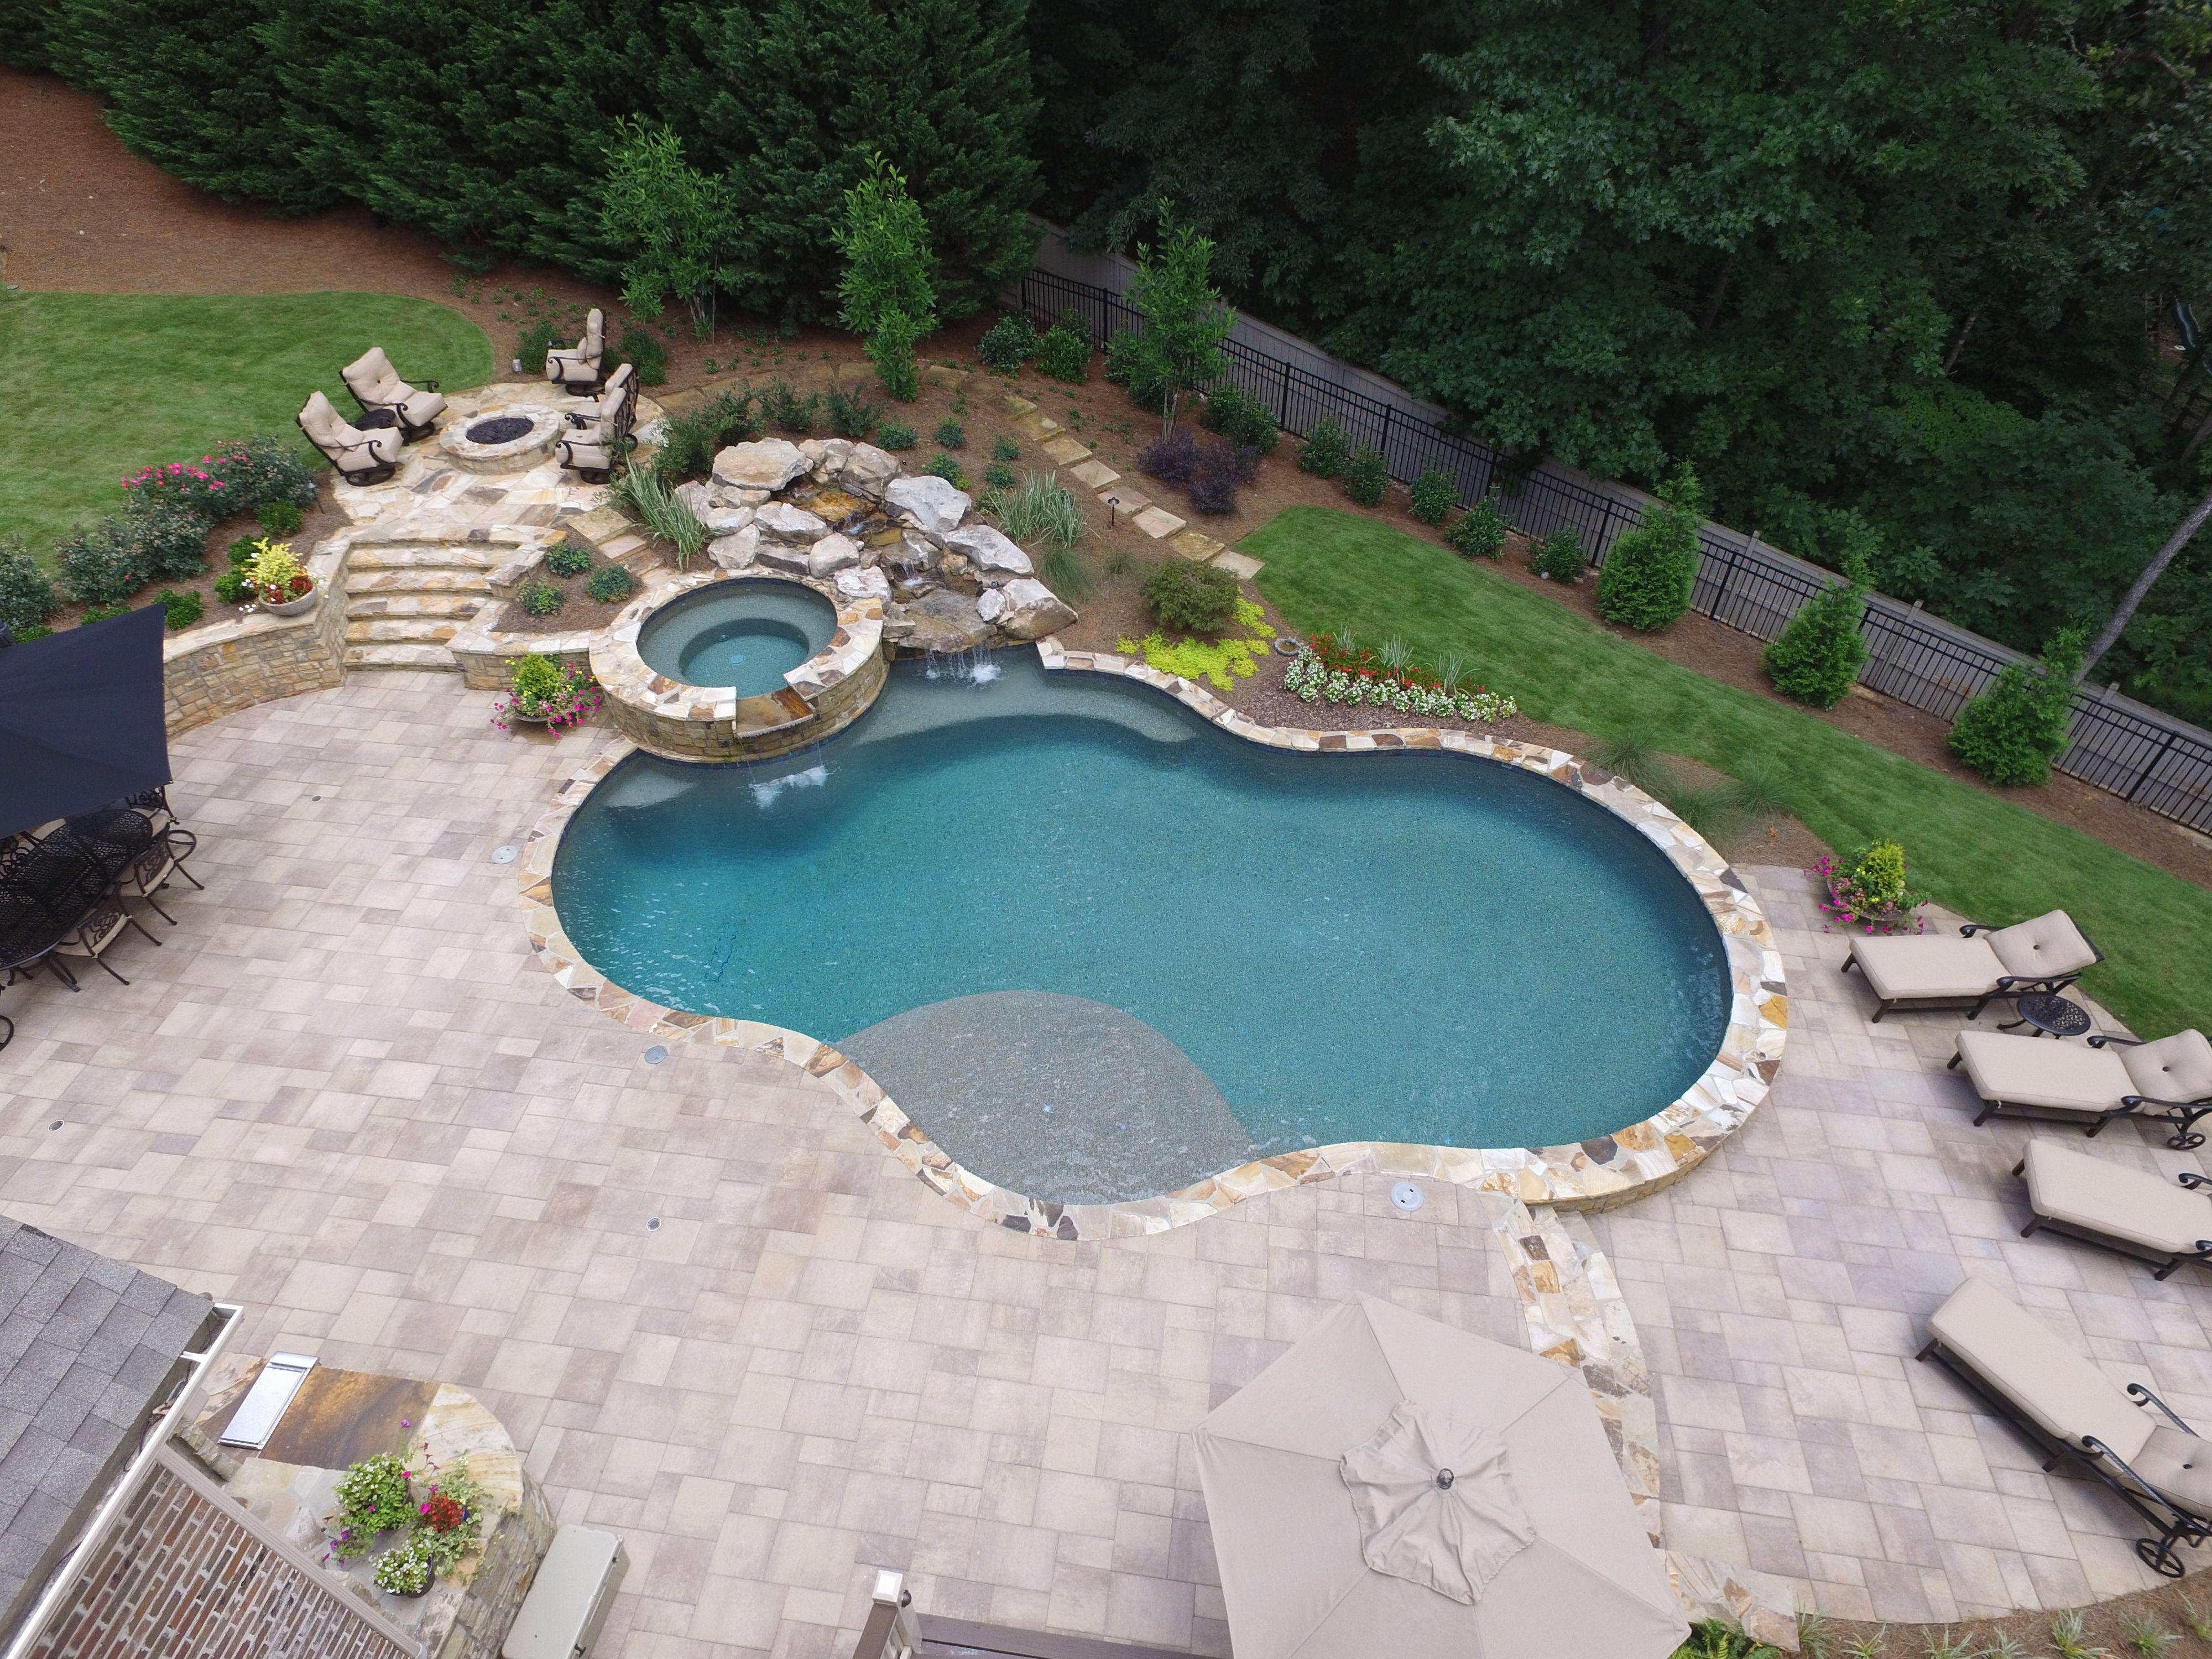 Inground Freeform Pool With Raised Spa Irregular Flagstone Coping